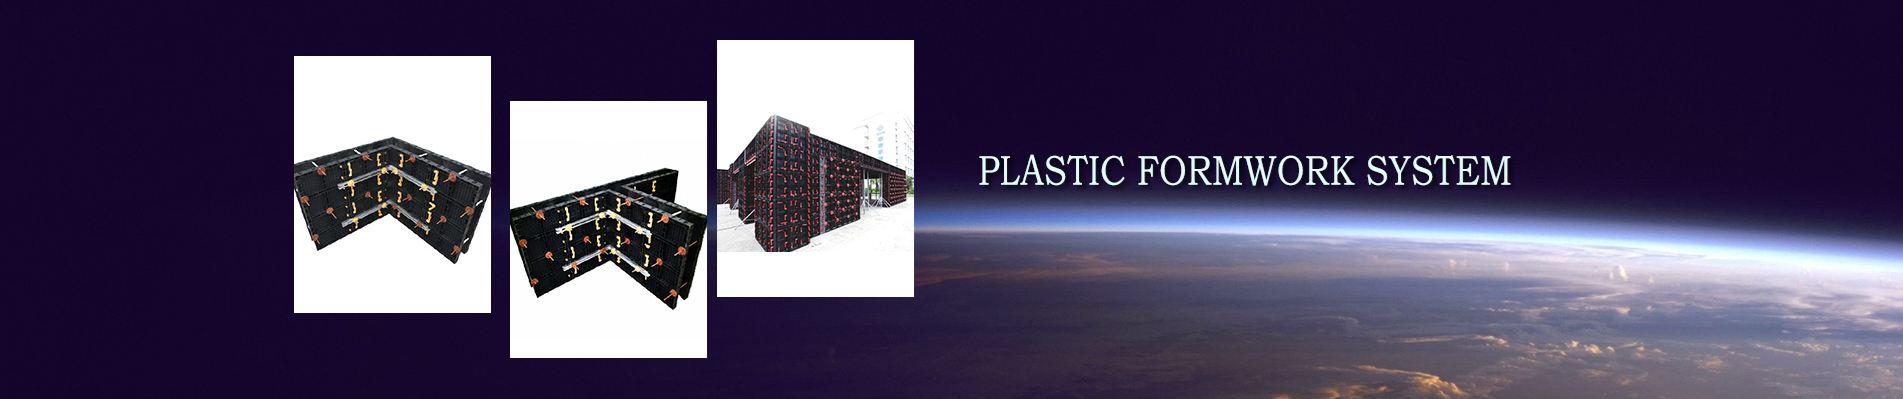 plastic-formwork